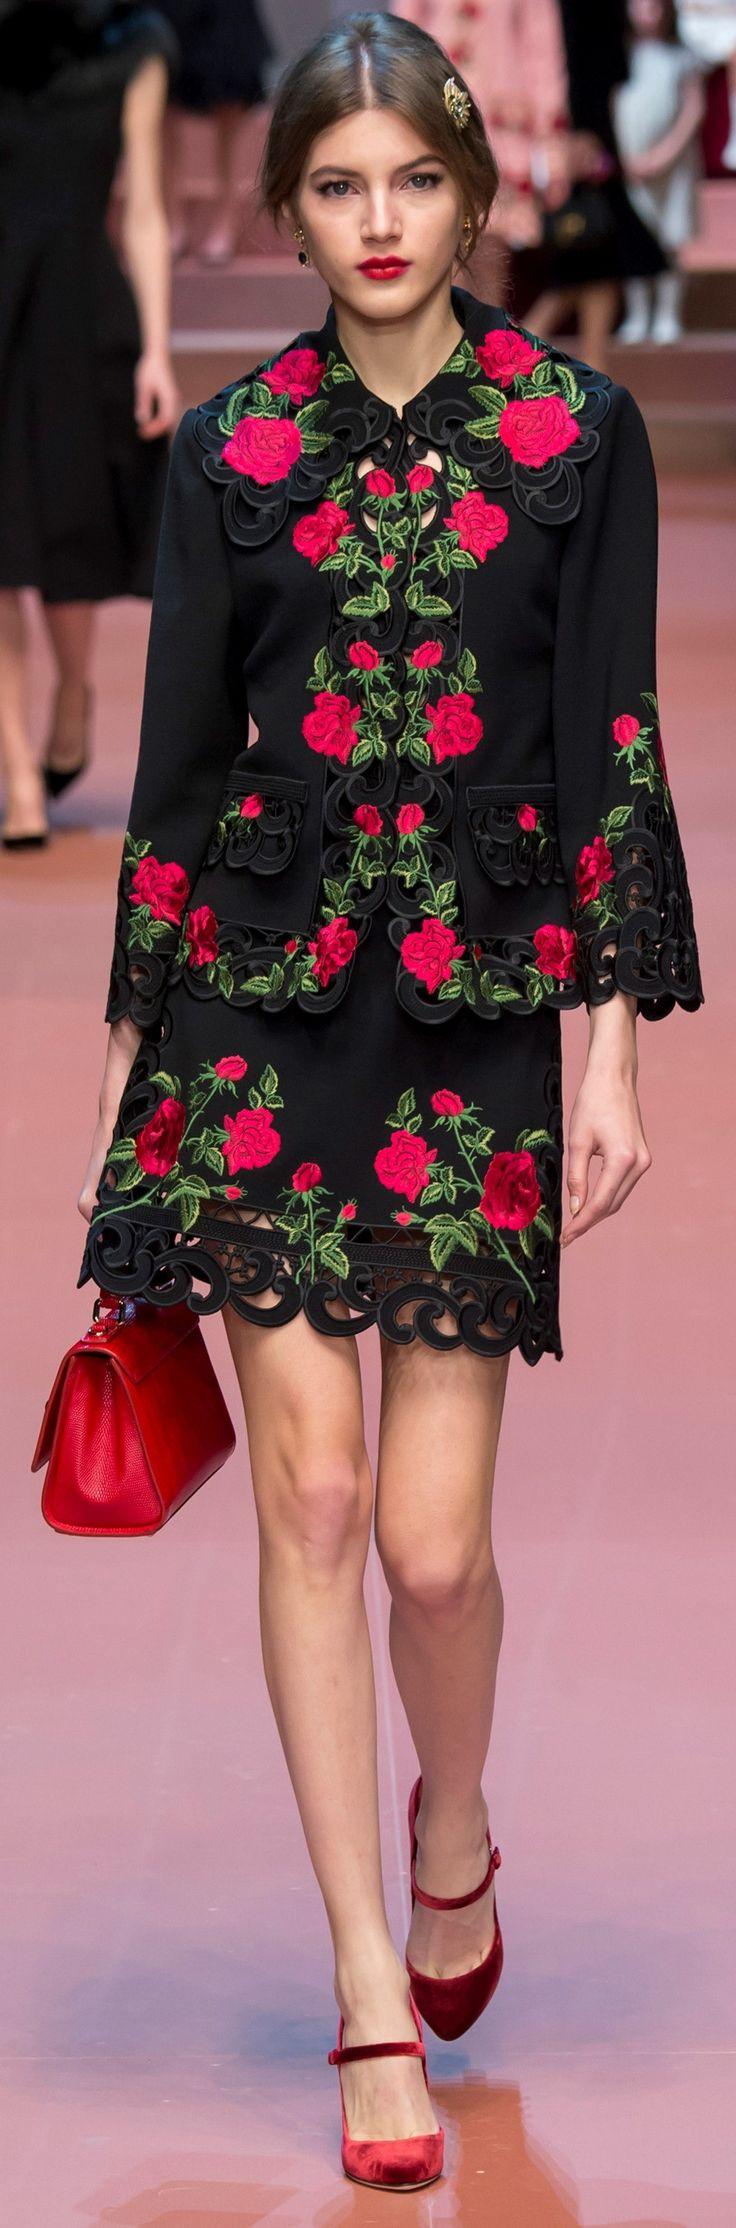 Dolce & Gabbana Autumn 2015, Valery Kaufman